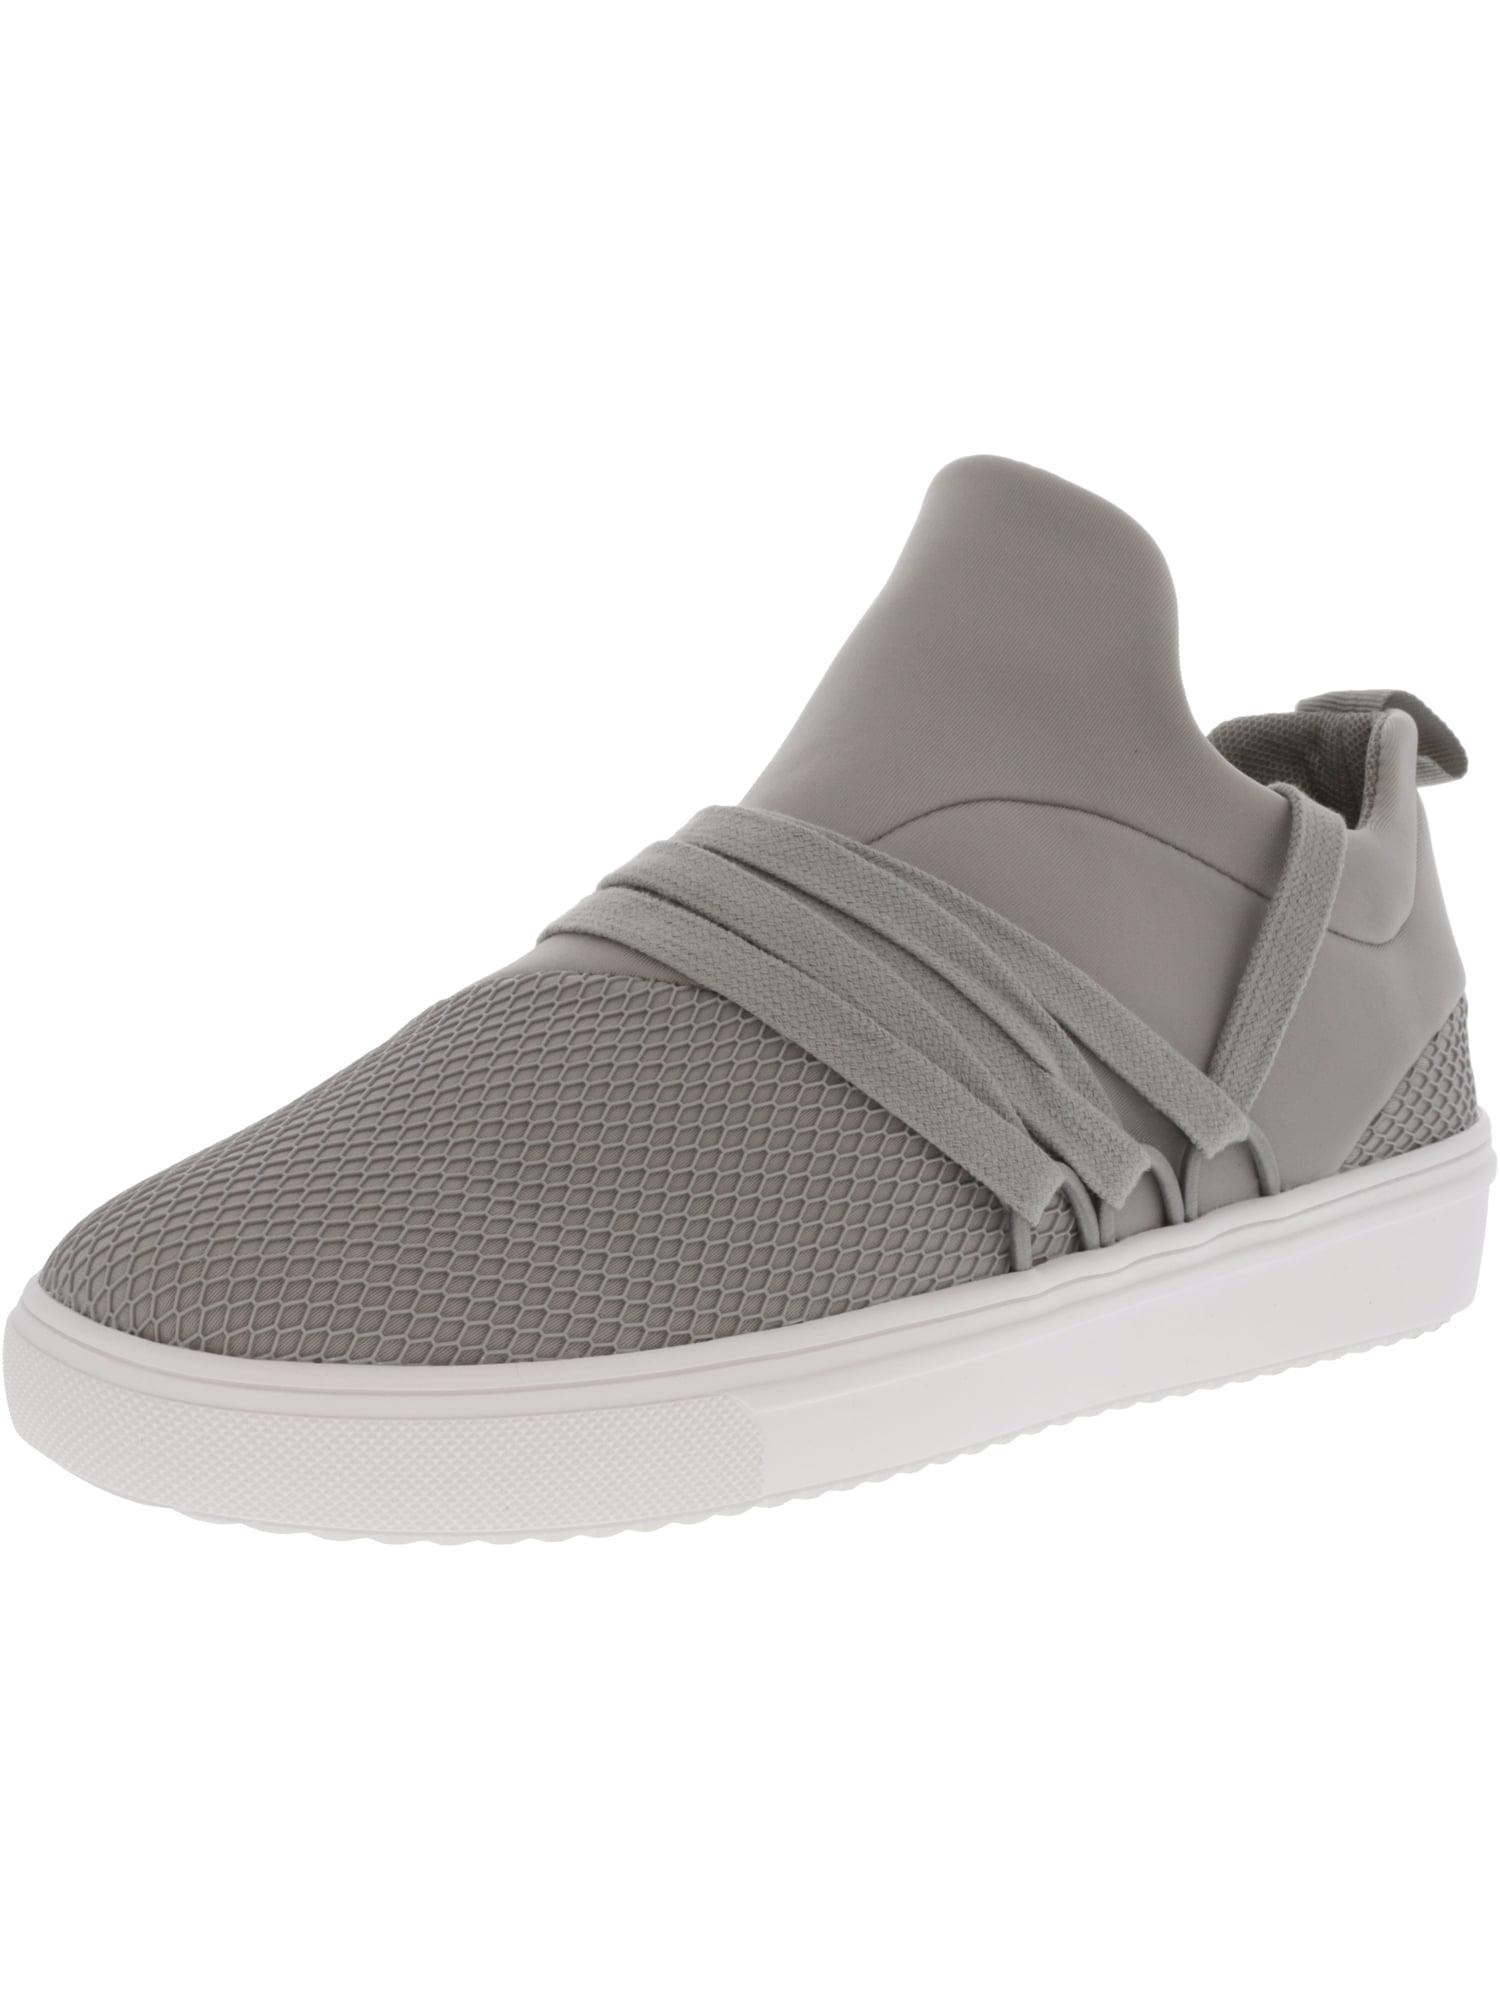 b9988c4c7d4 Steve Madden Women's Lancer Blush Ankle-High Fabric Fashion Sneaker - 8M